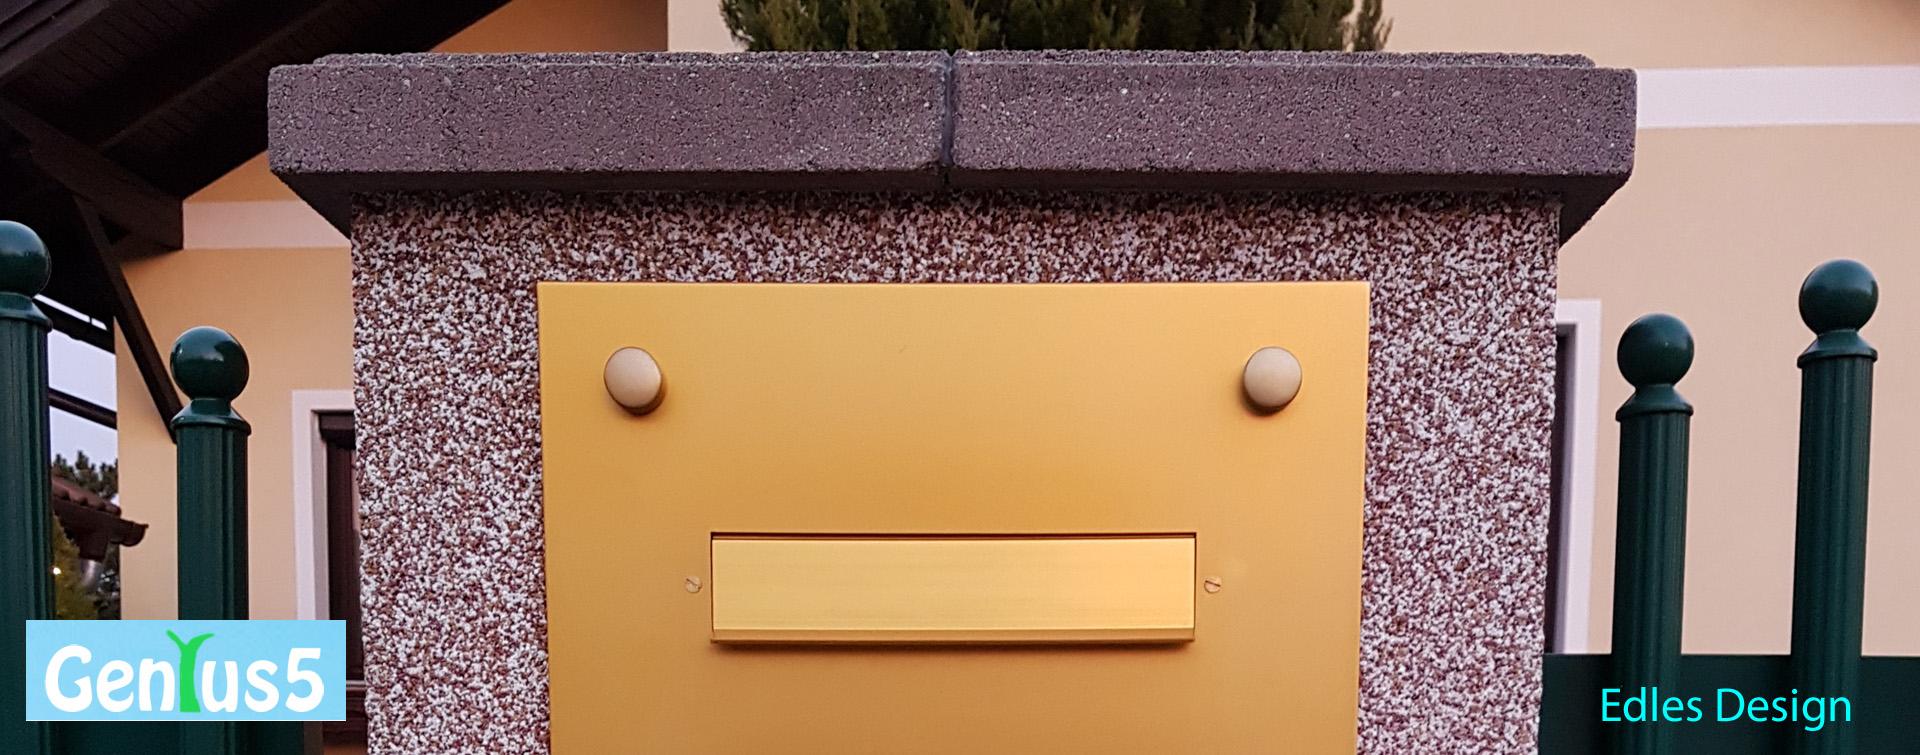 Klingelplatte-edles-Design